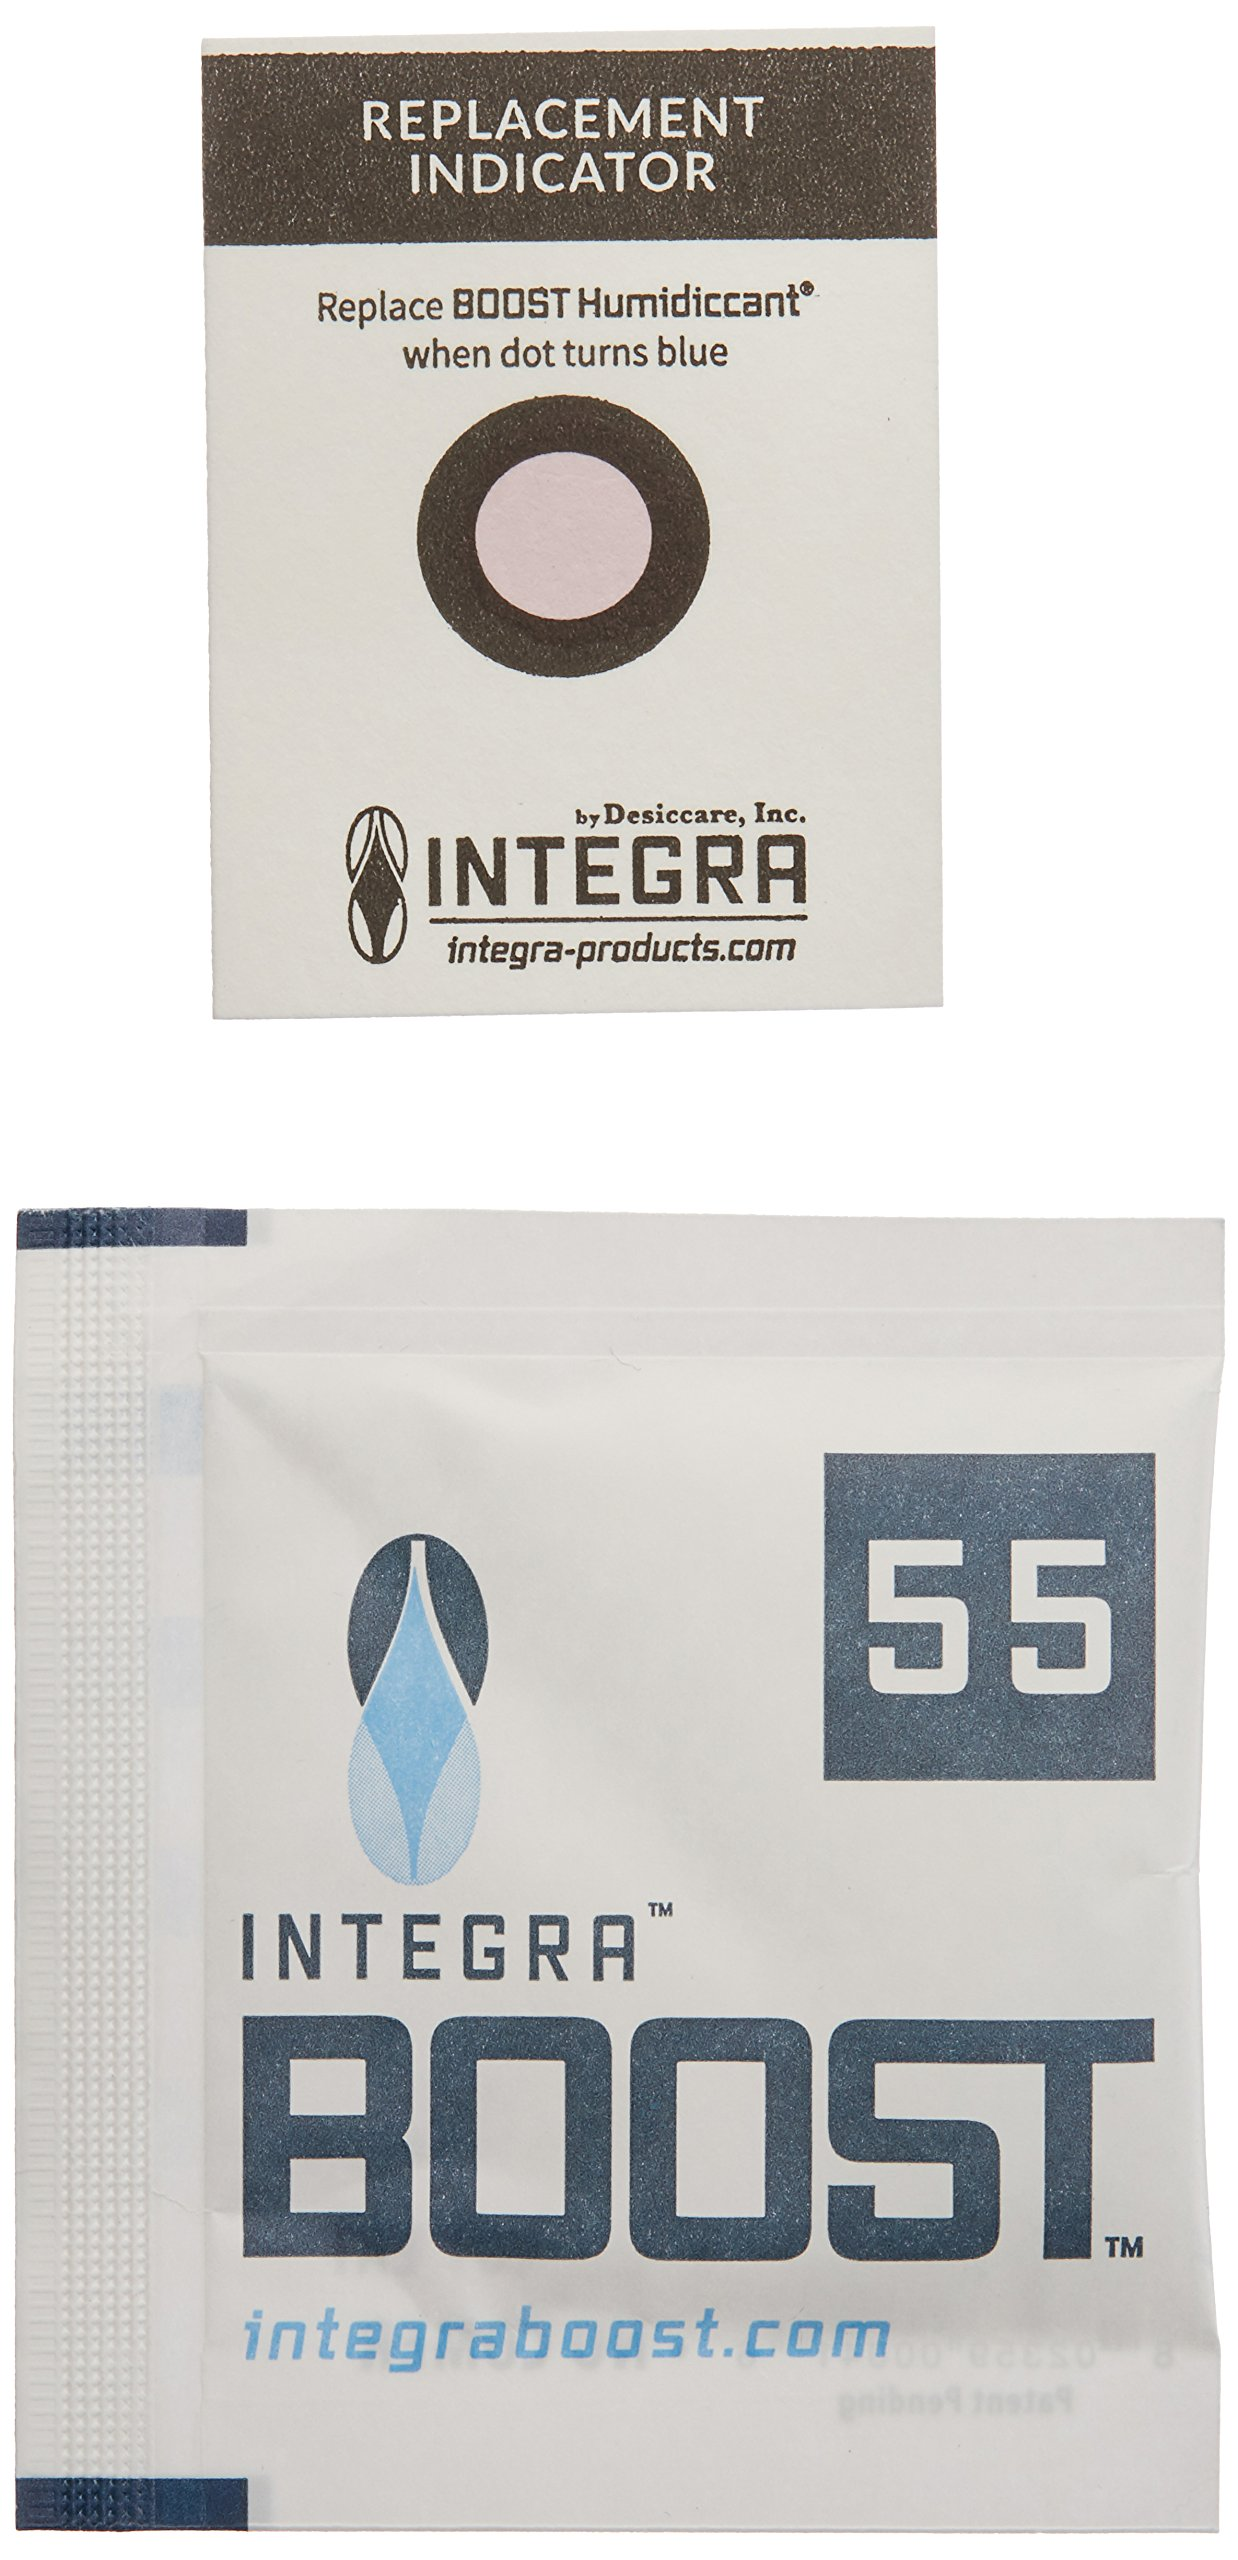 INTEGRA BOOST 2-Way Humidity Control, 8 g